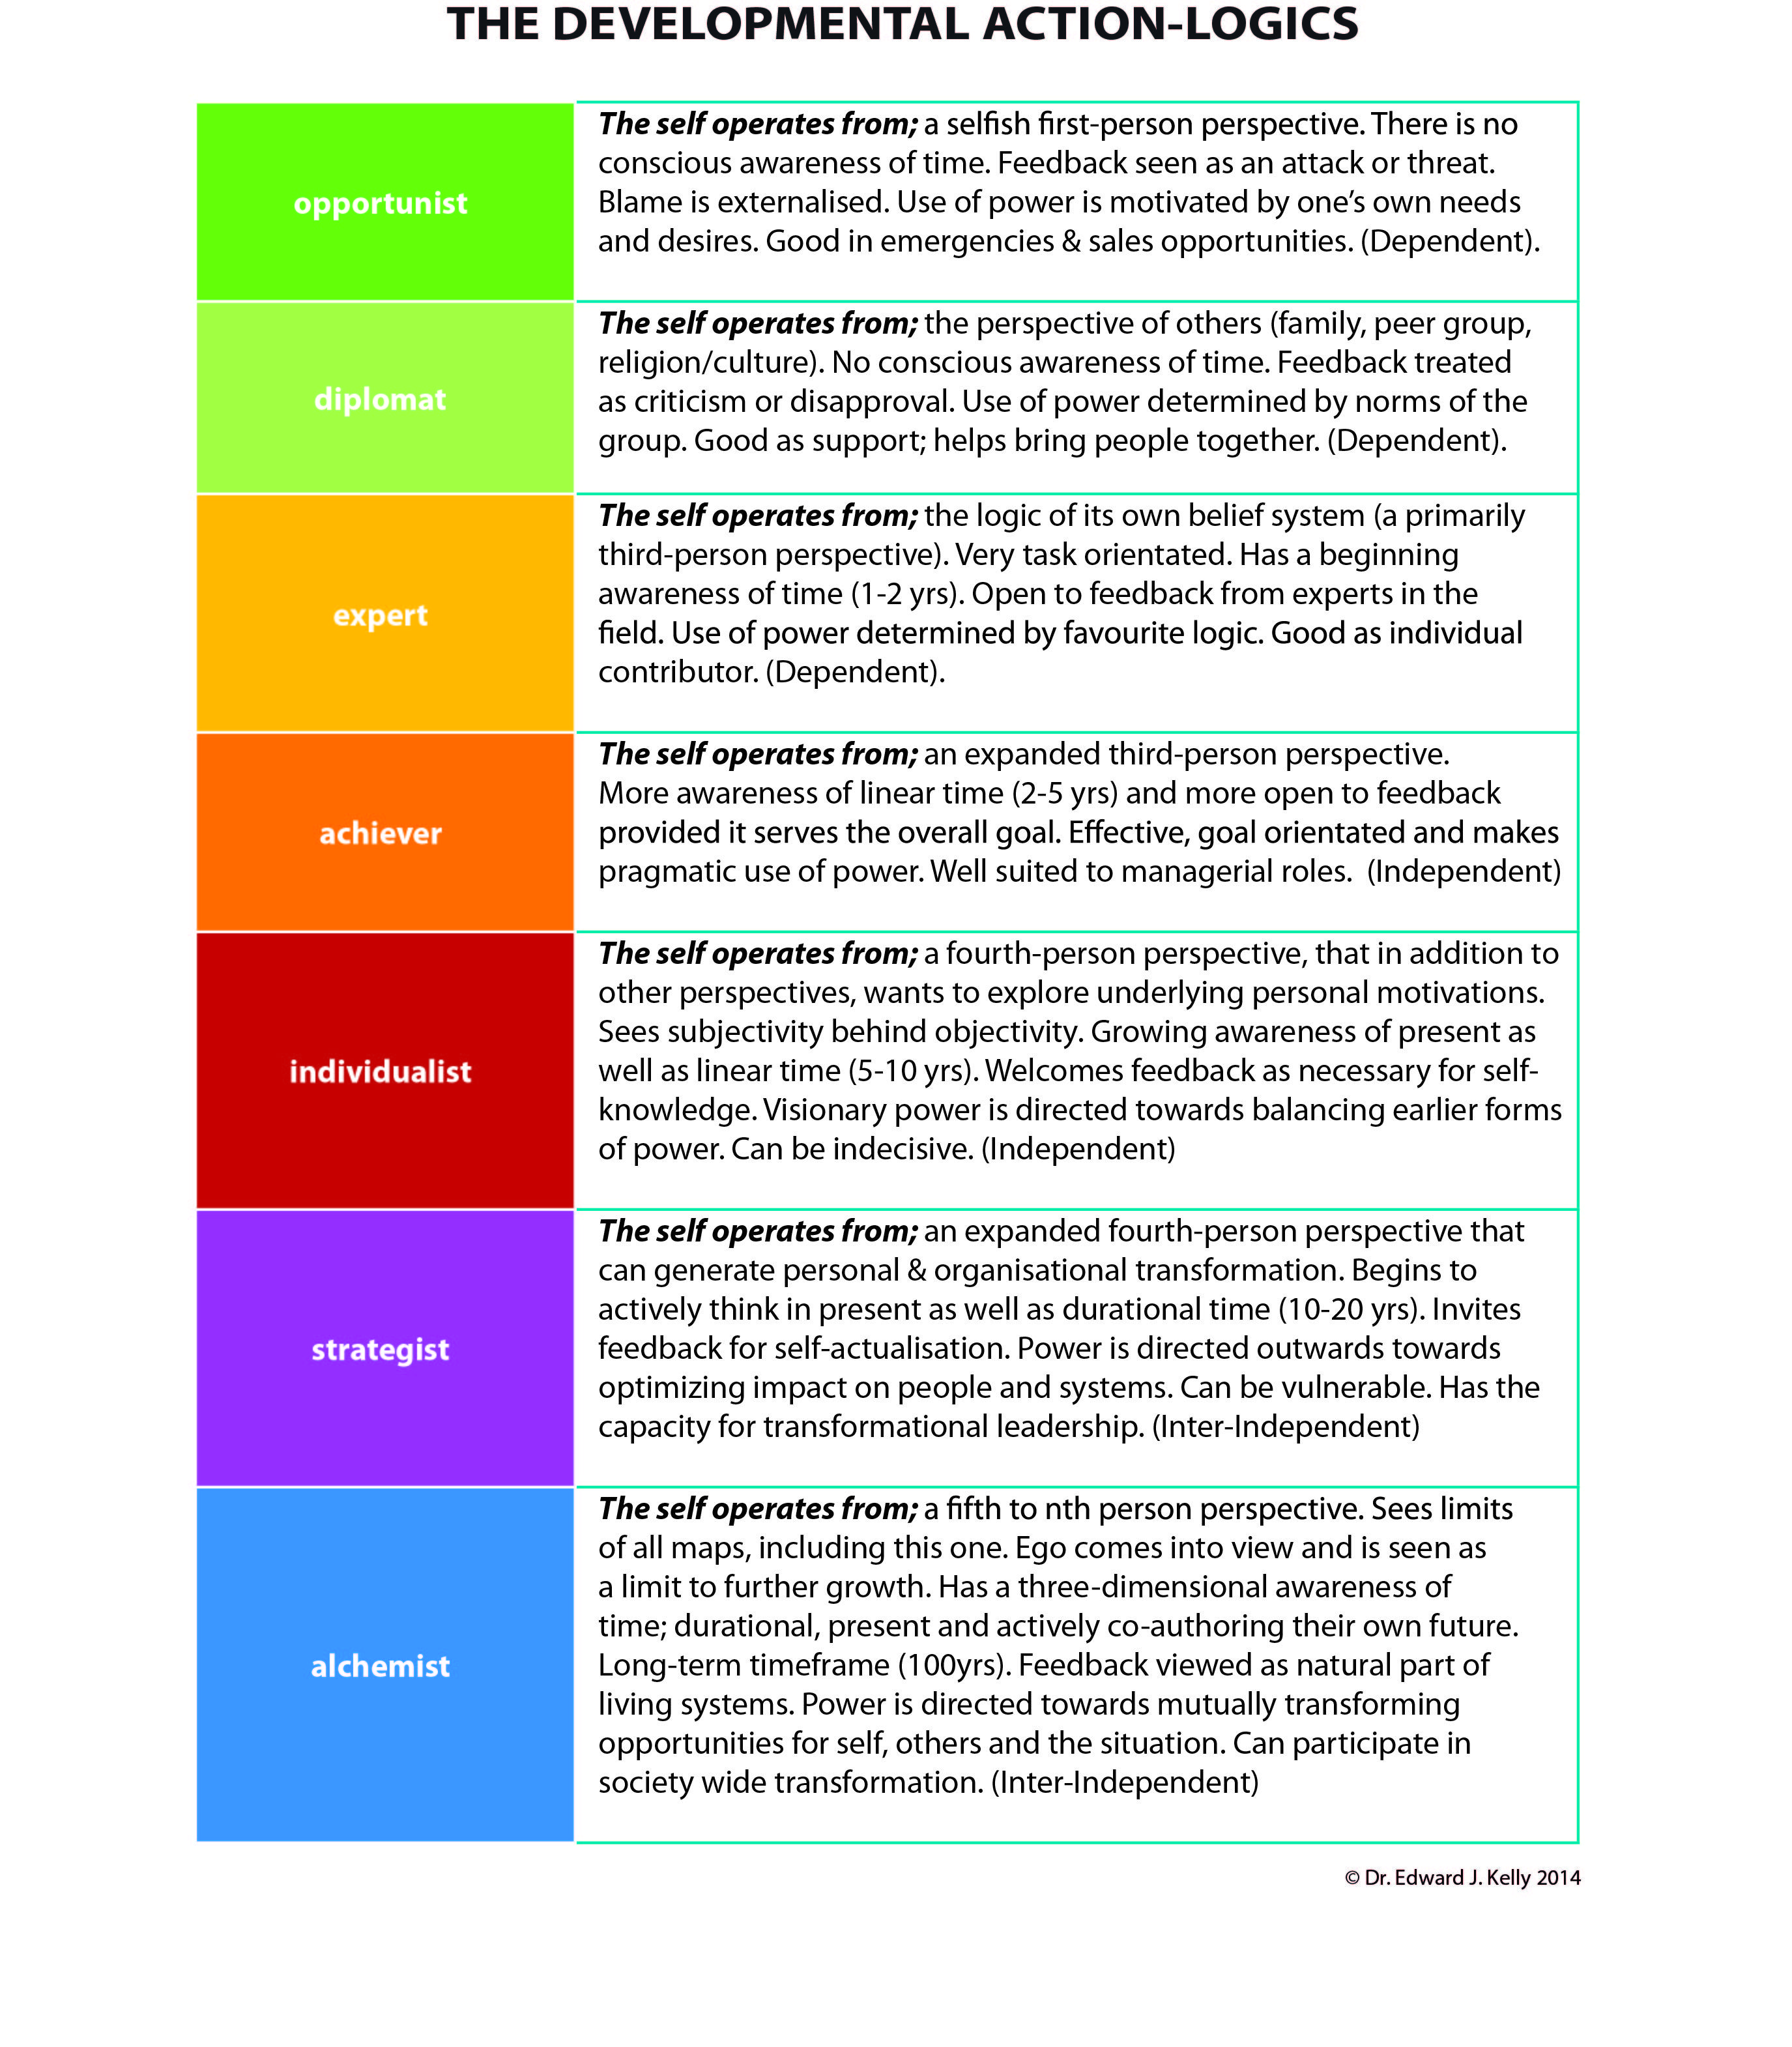 Table 2 The Developmental Action Logics